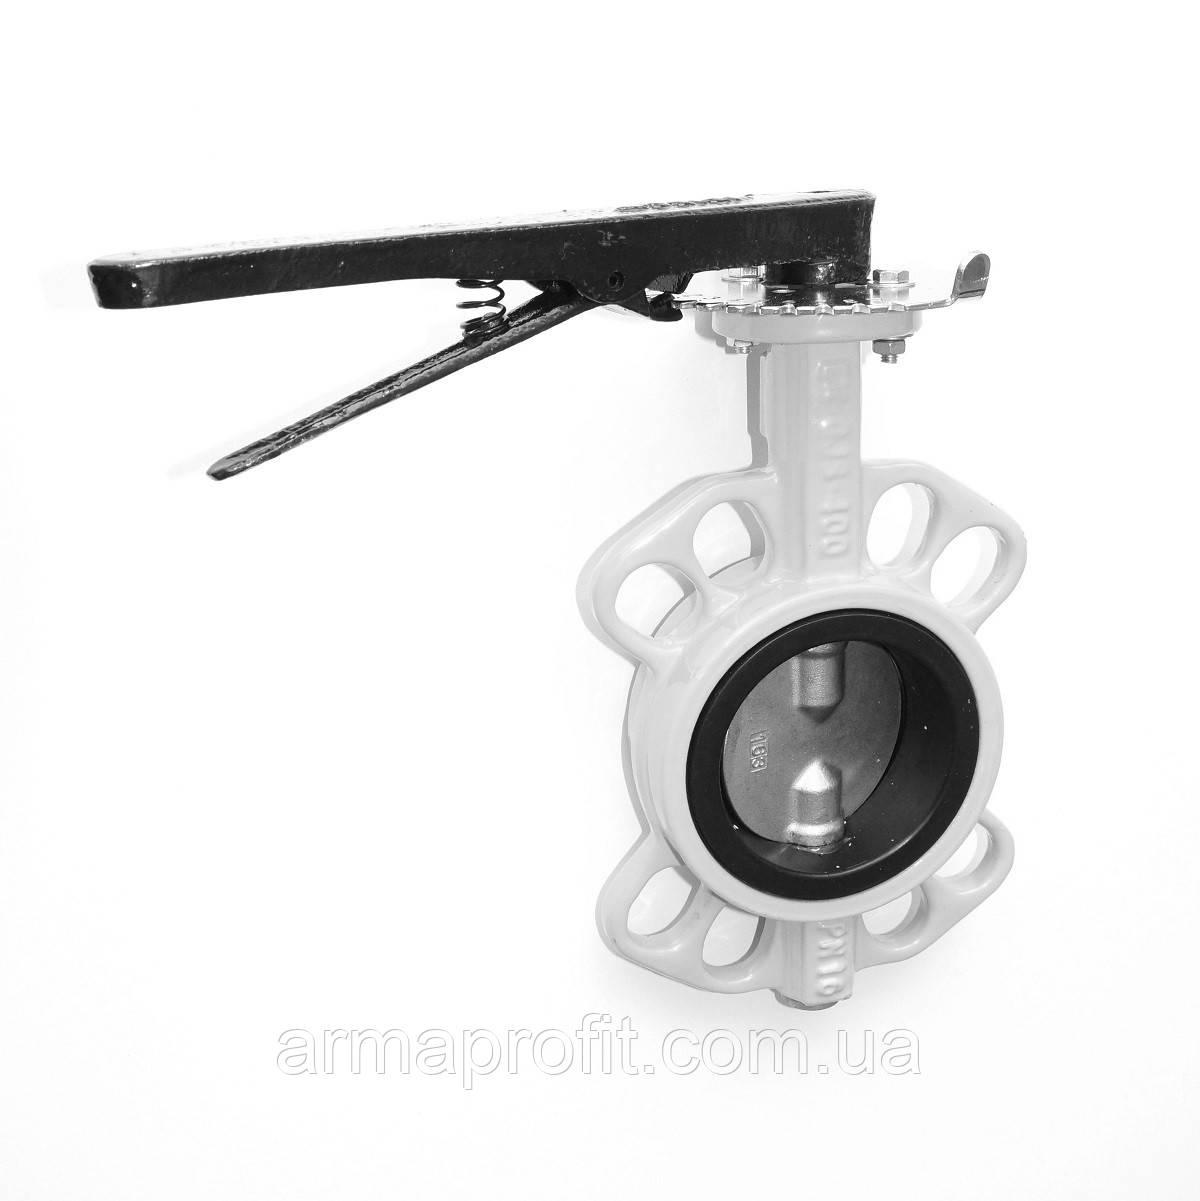 Задвижка поворотная Баттерфляй для газа RBV-16-40(G) Ду65 Ру16 (P204)